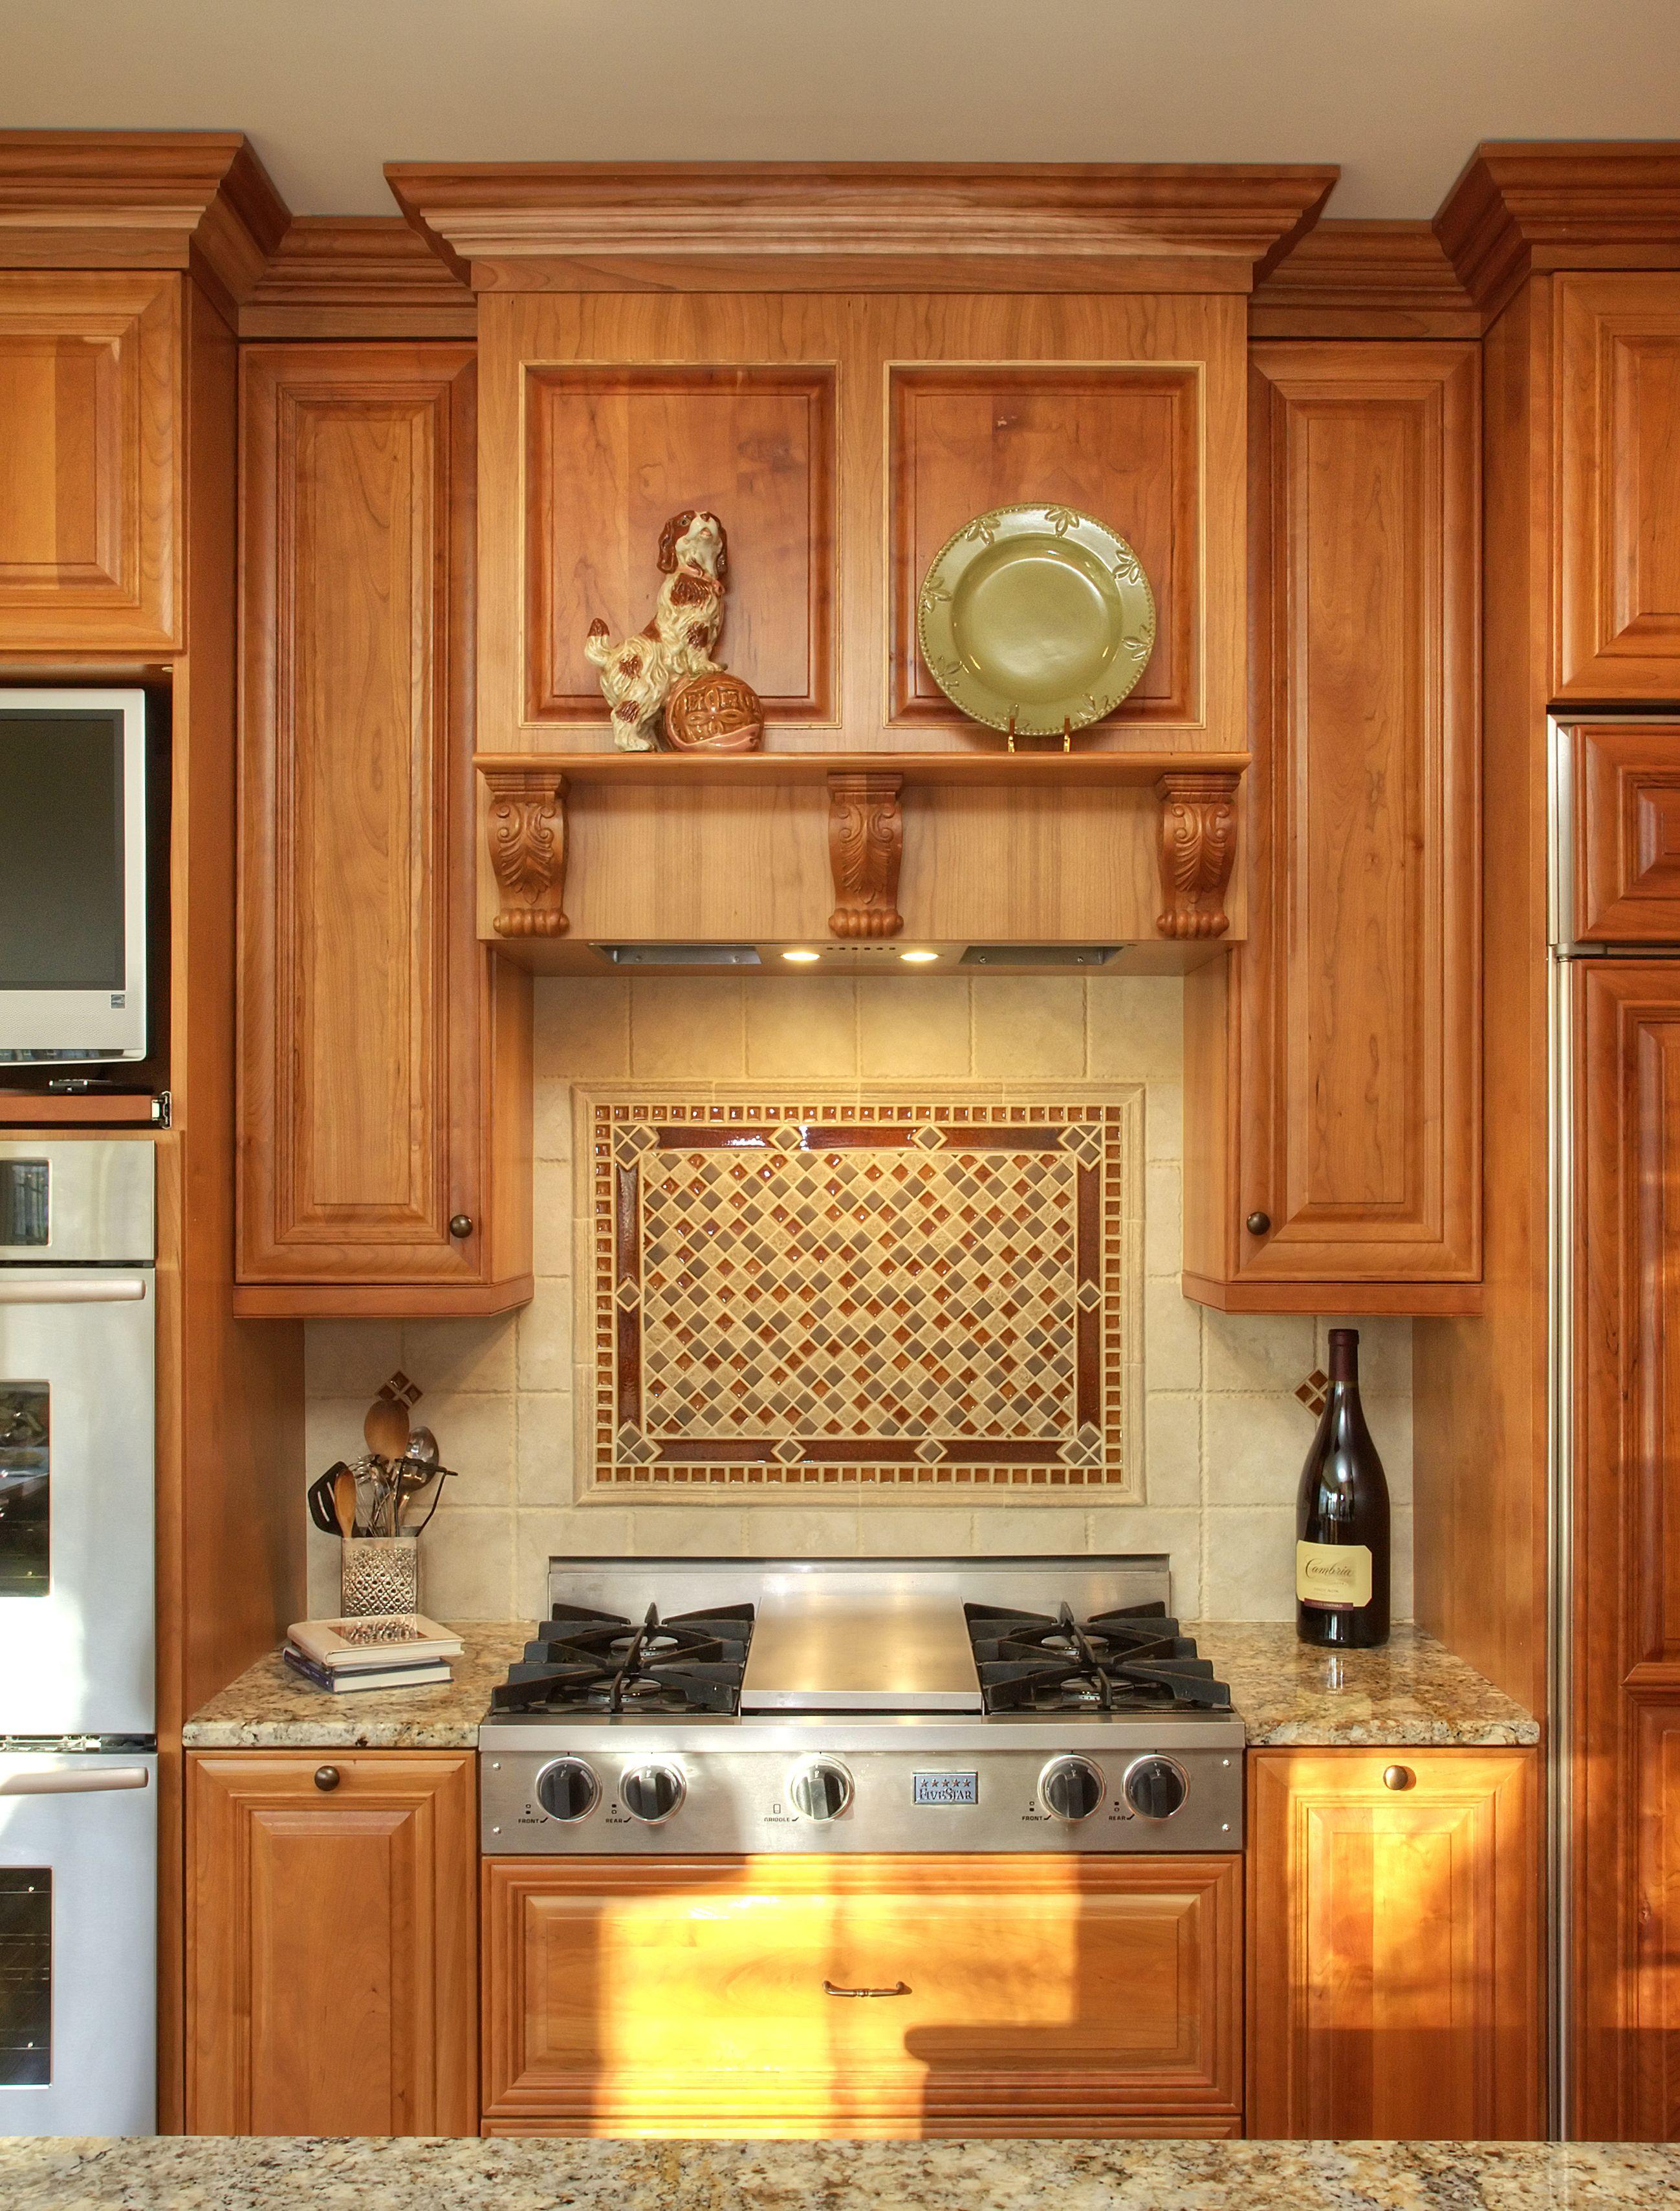 wooden kitchen cabinets backsplash